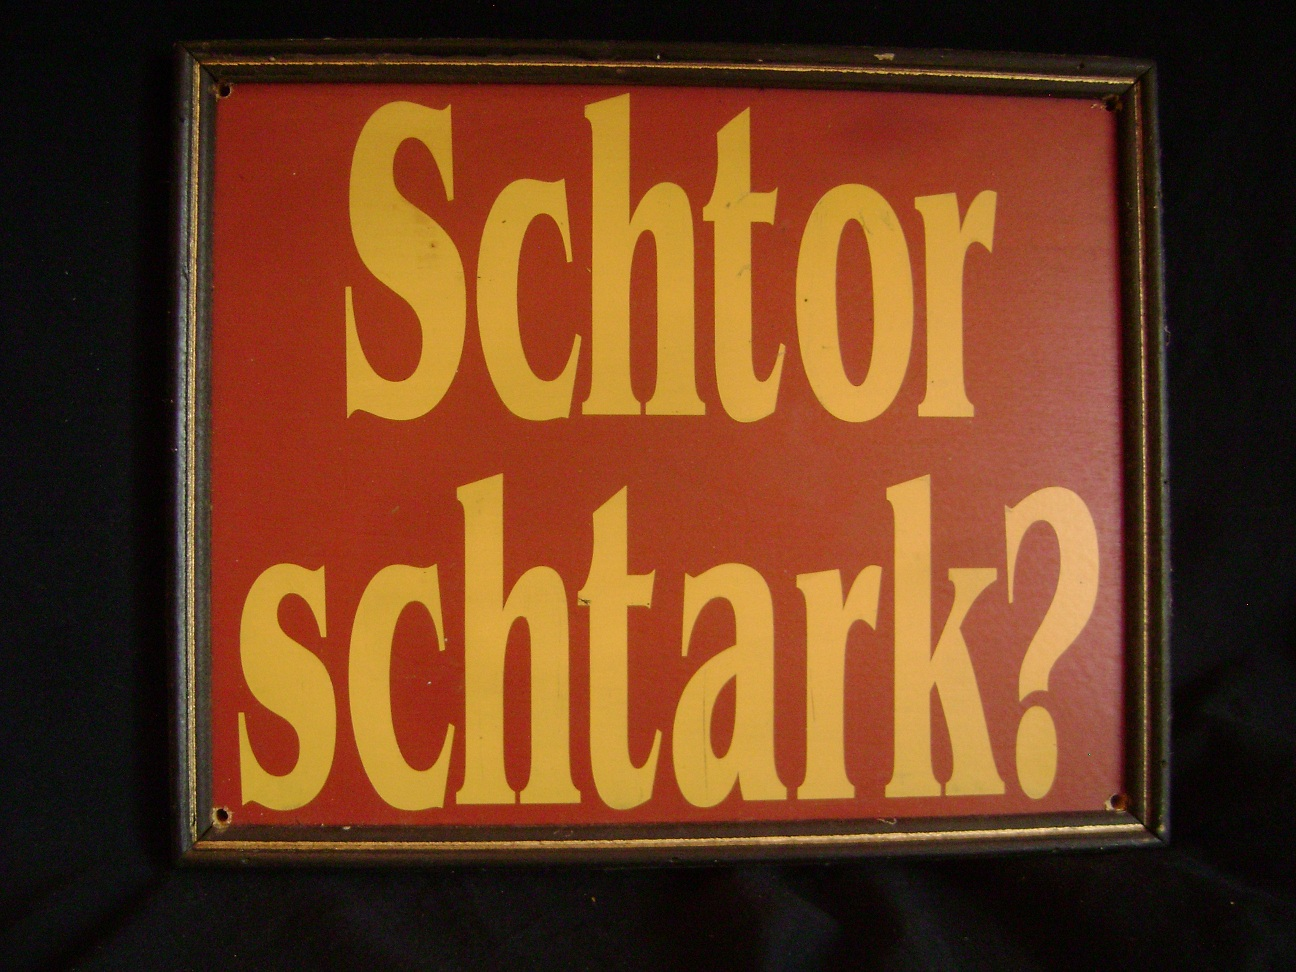 Tabla_Schtor_schtark_1.JPG